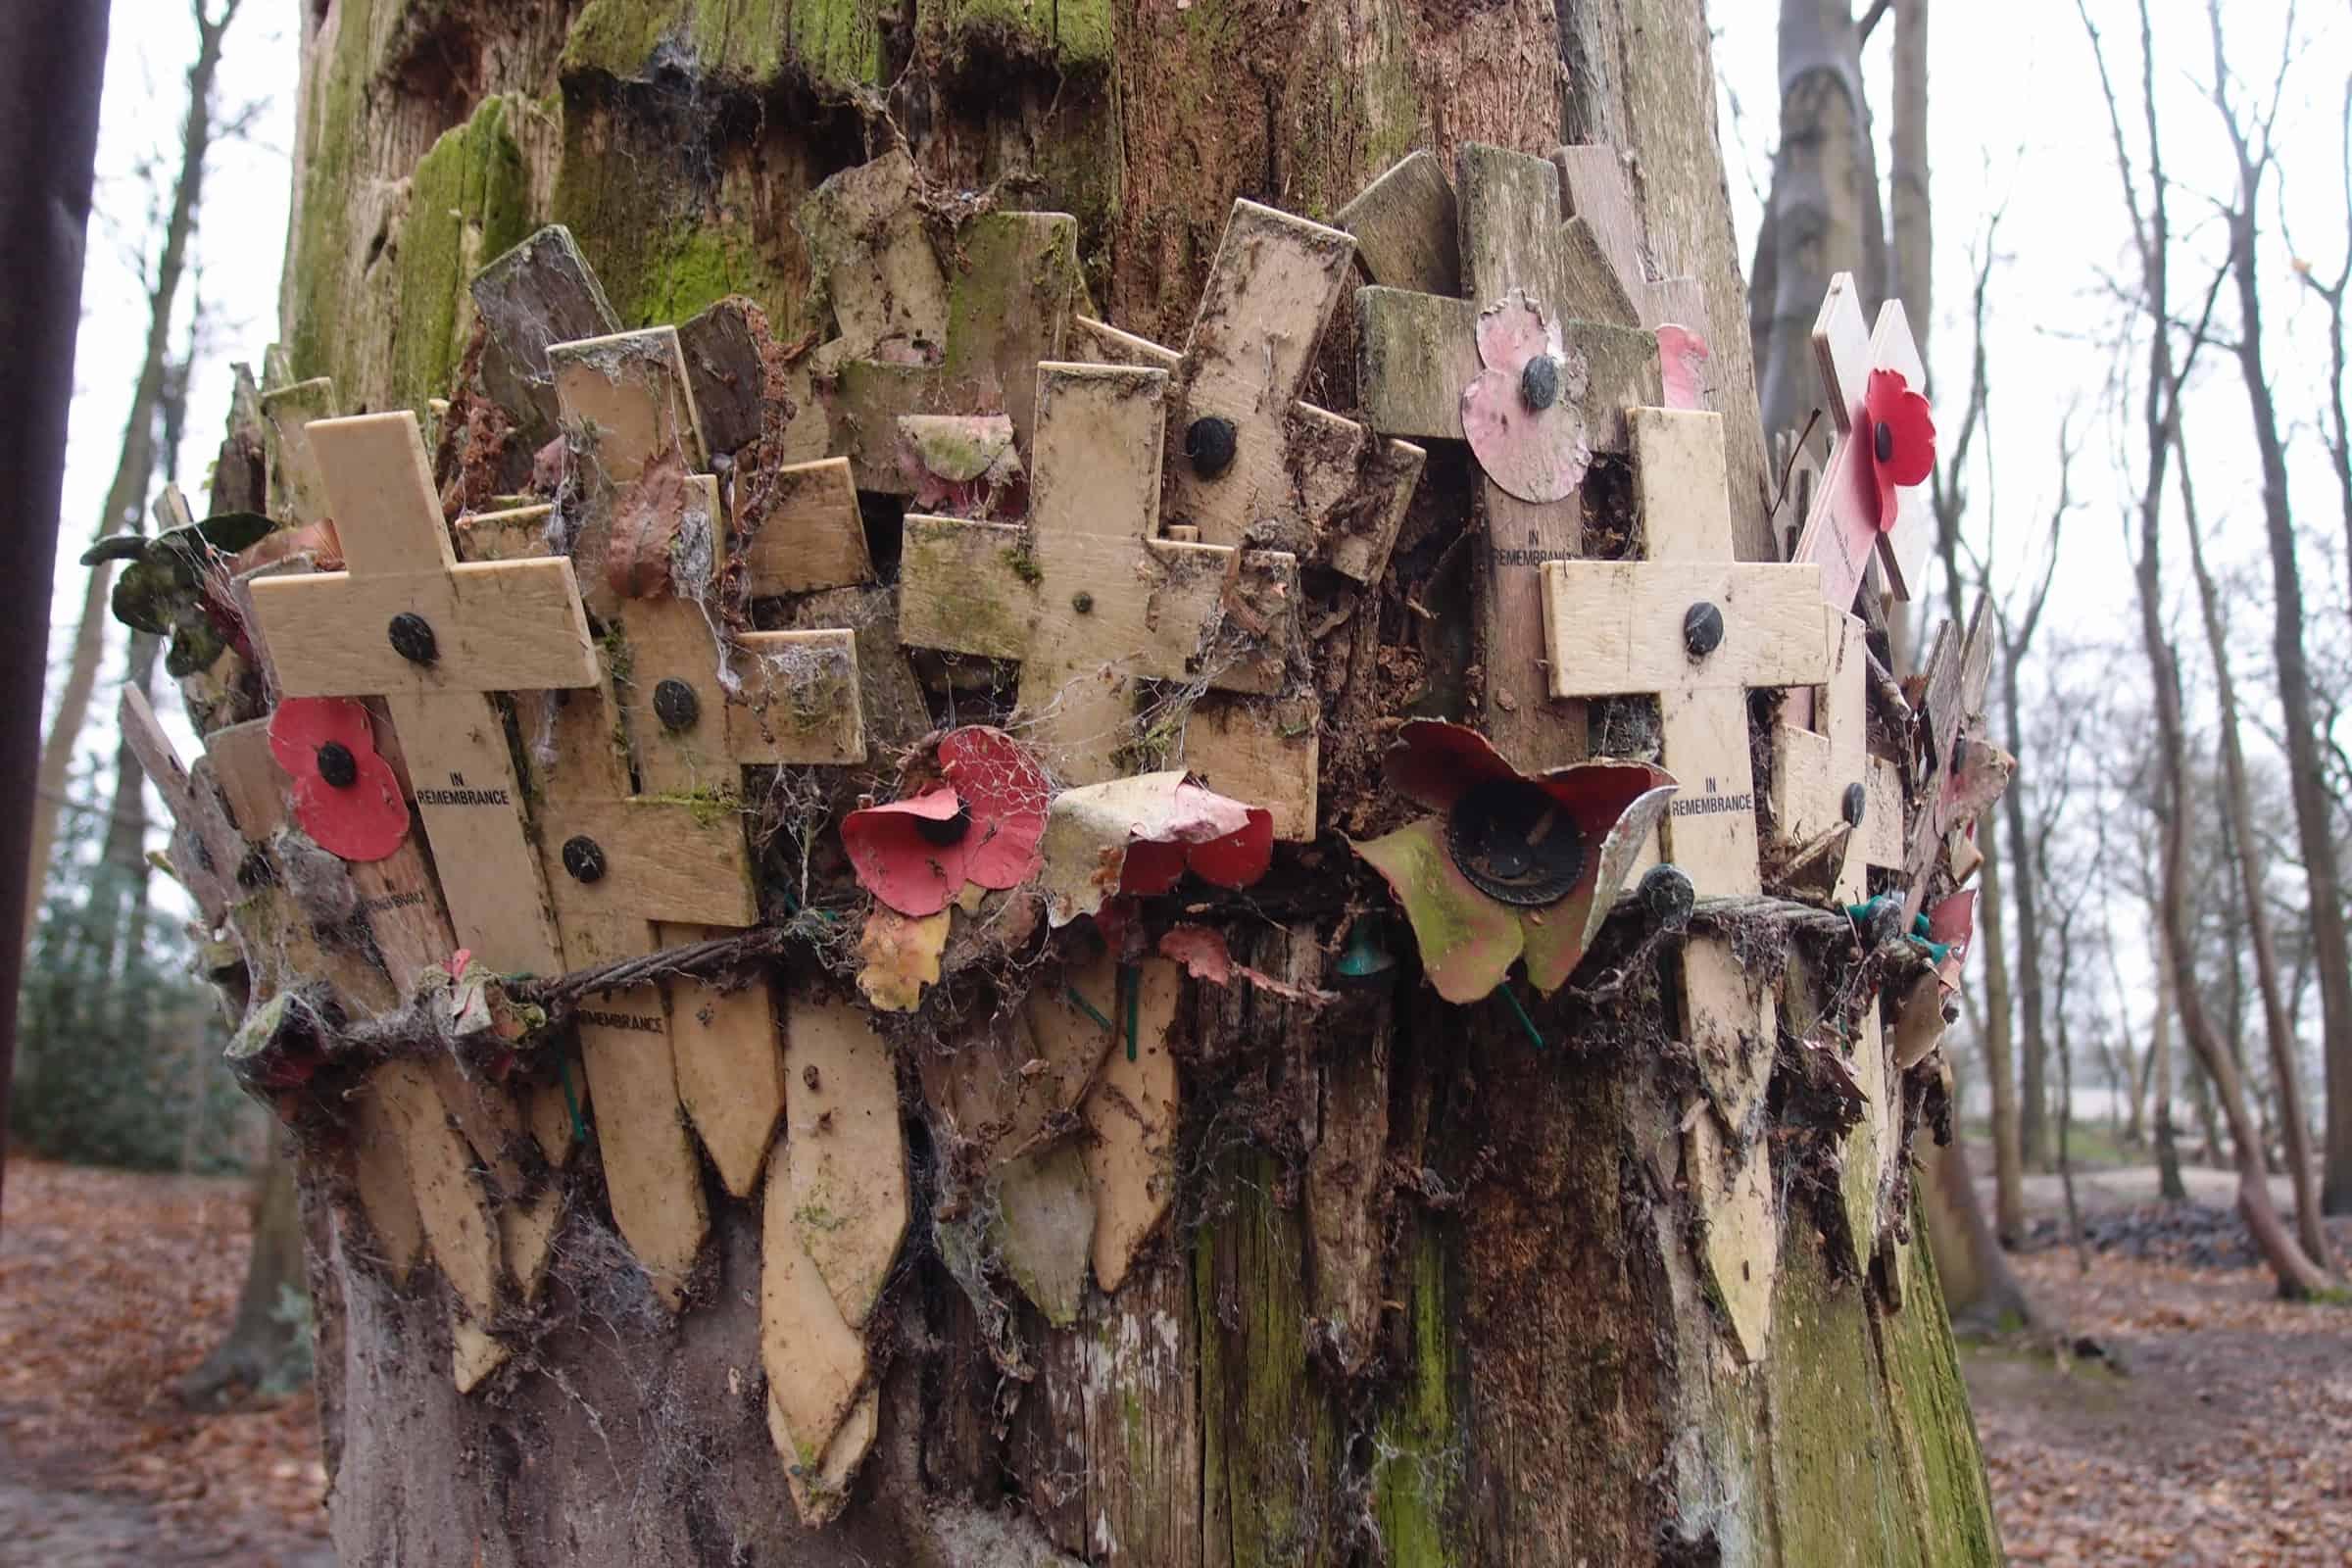 Memorial for the fallen at Sanctuary Wood. Photograph © www.foxtrotfilms.com